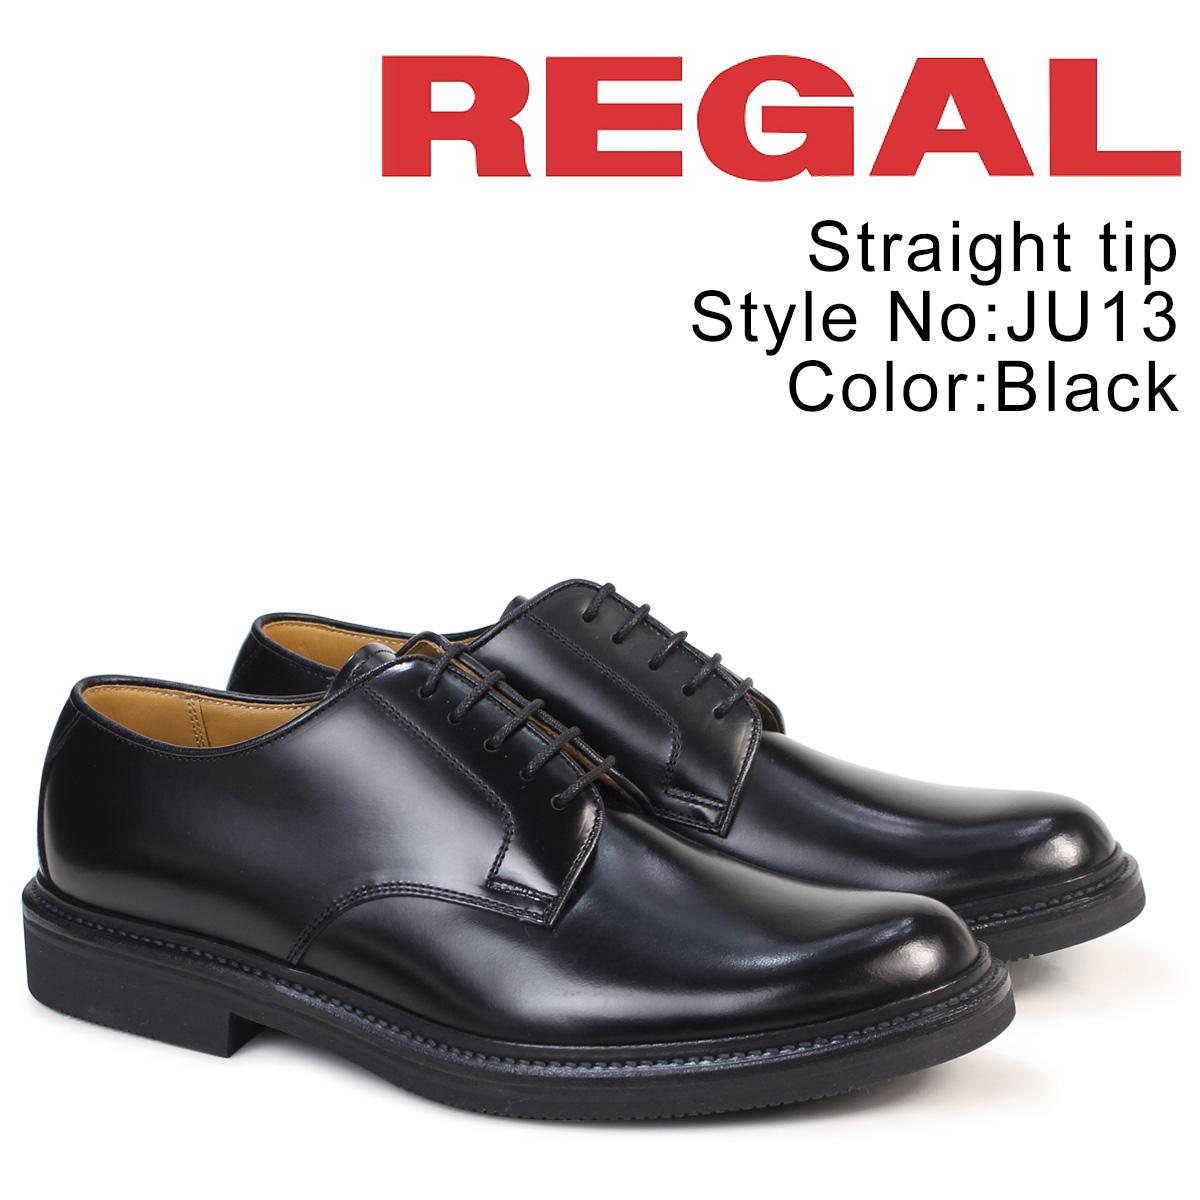 REGAL 靴 メンズ リーガル プレーントゥ JU13AG ビジネスシューズ ブラック [9/12 追加入荷]